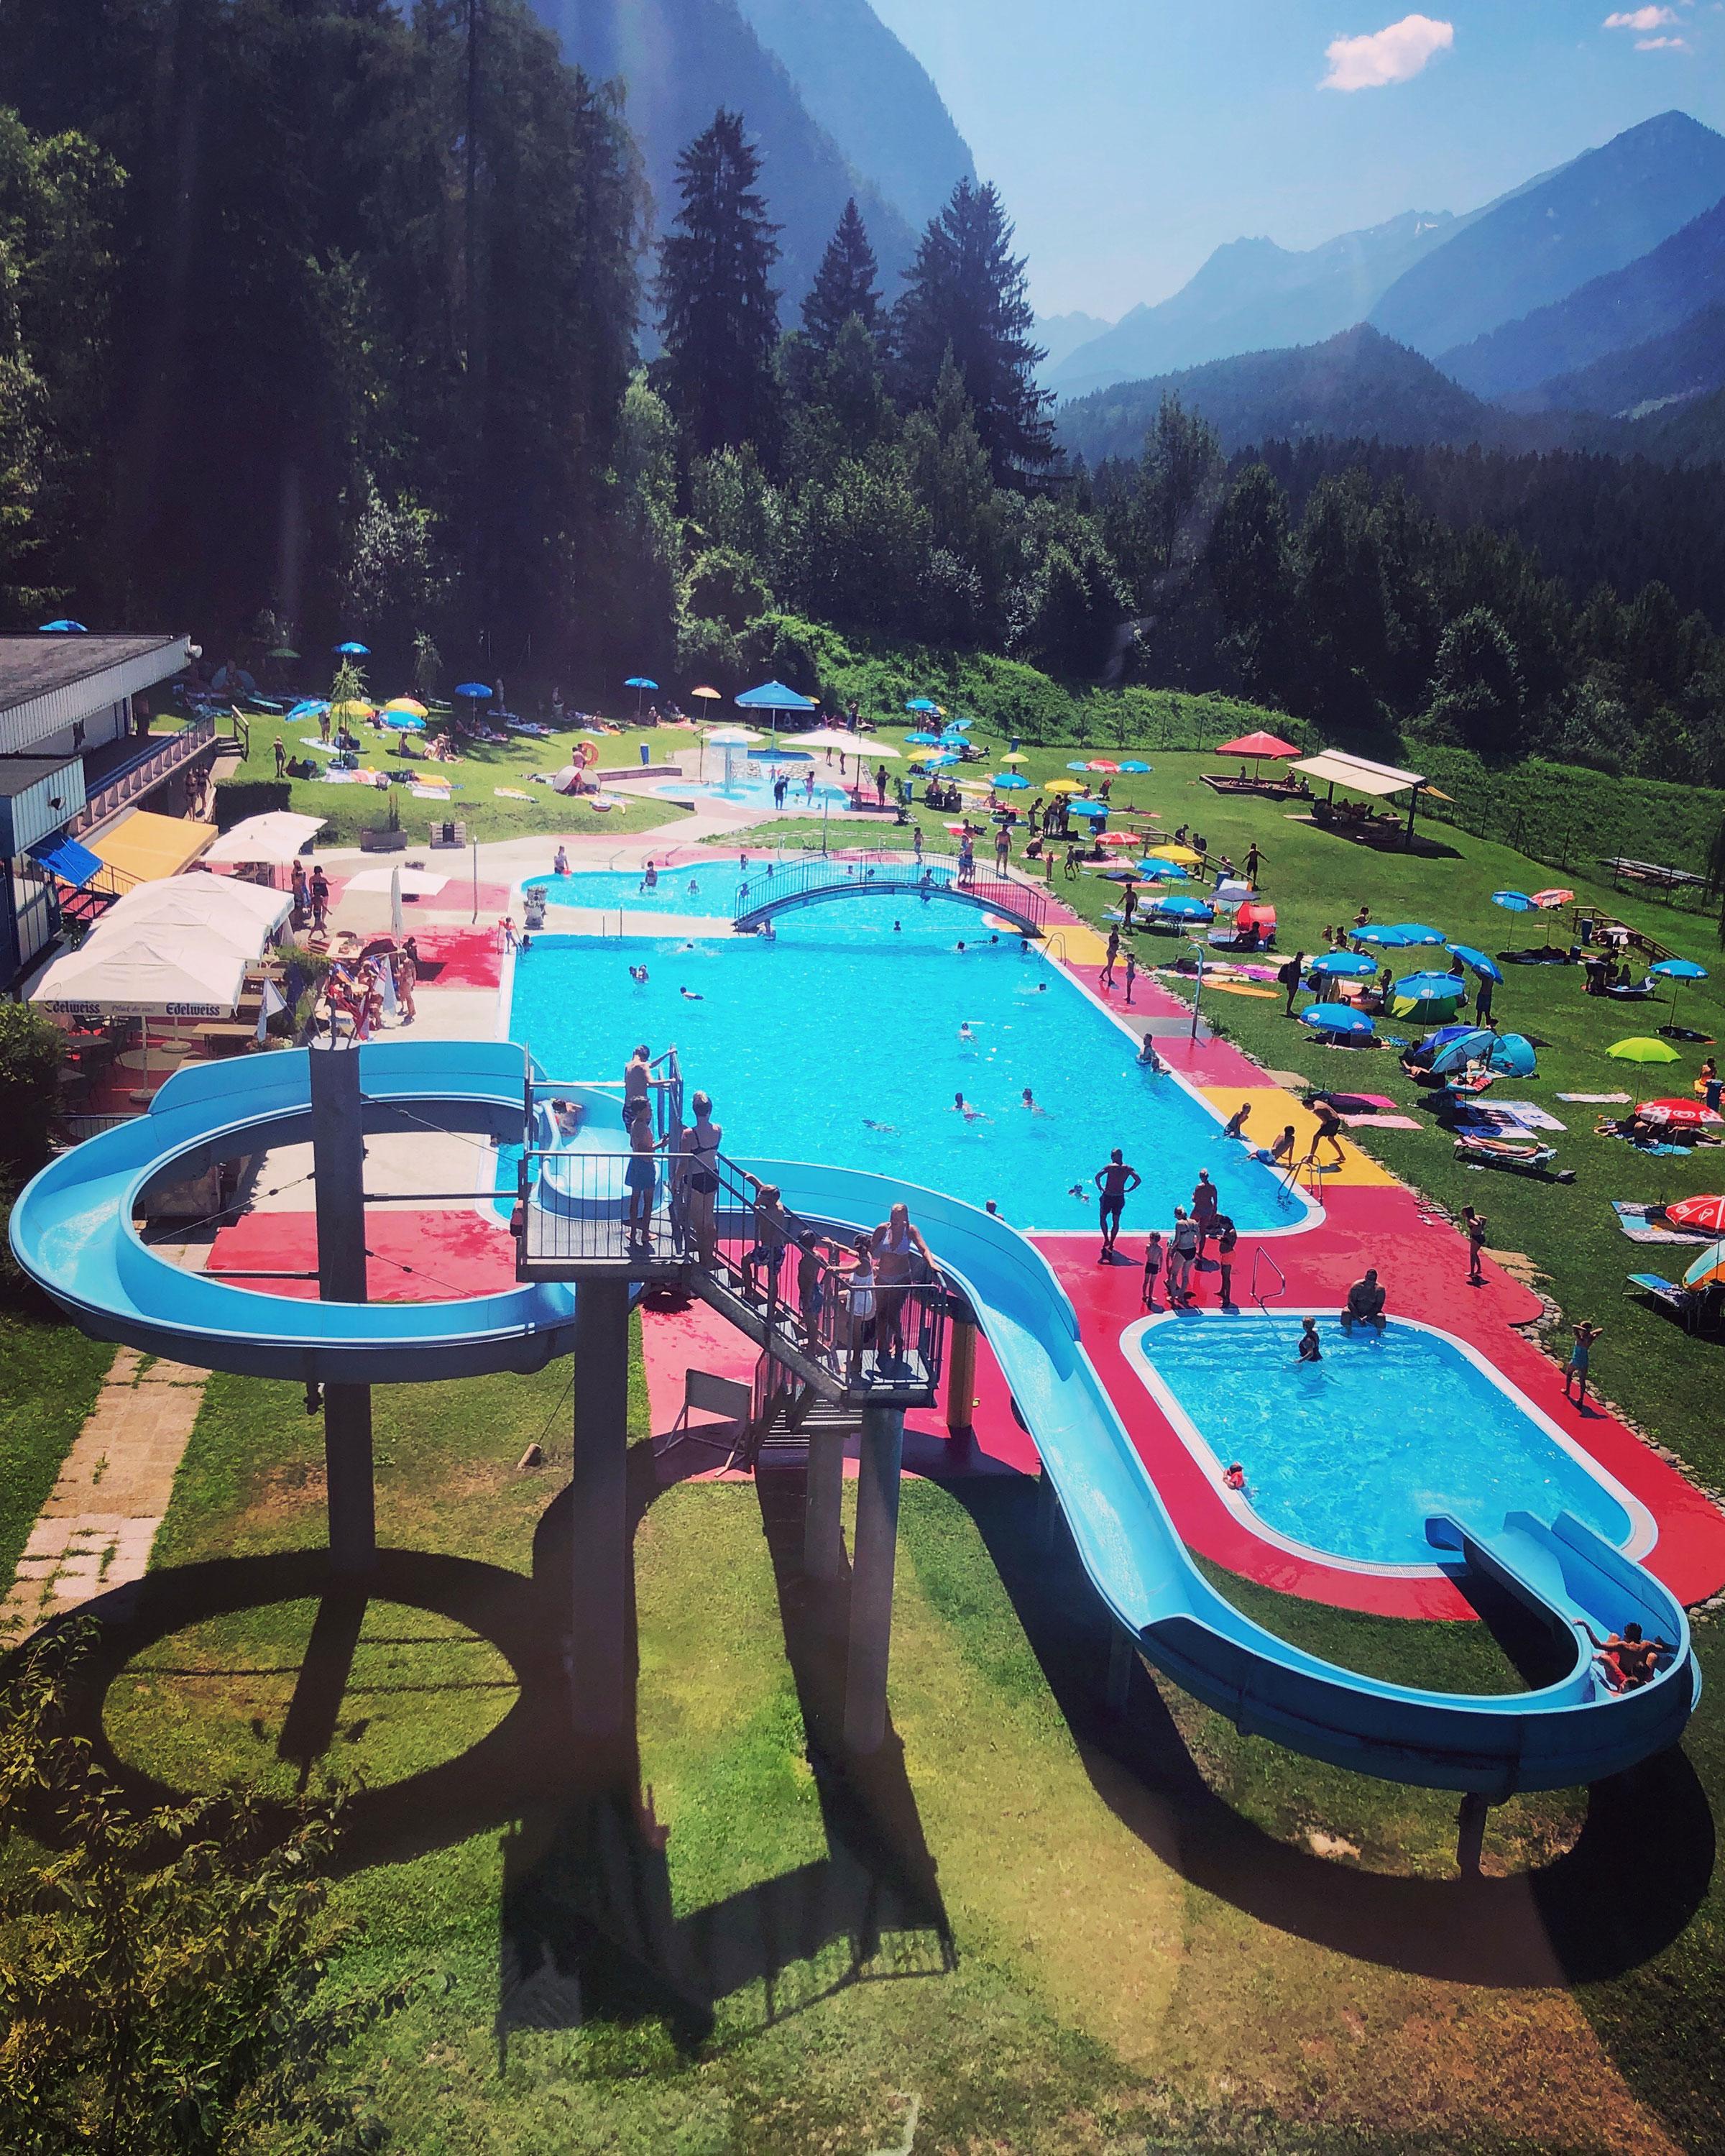 Erlebnisbad Oetz - Familienurlaub Ötztal Tirol